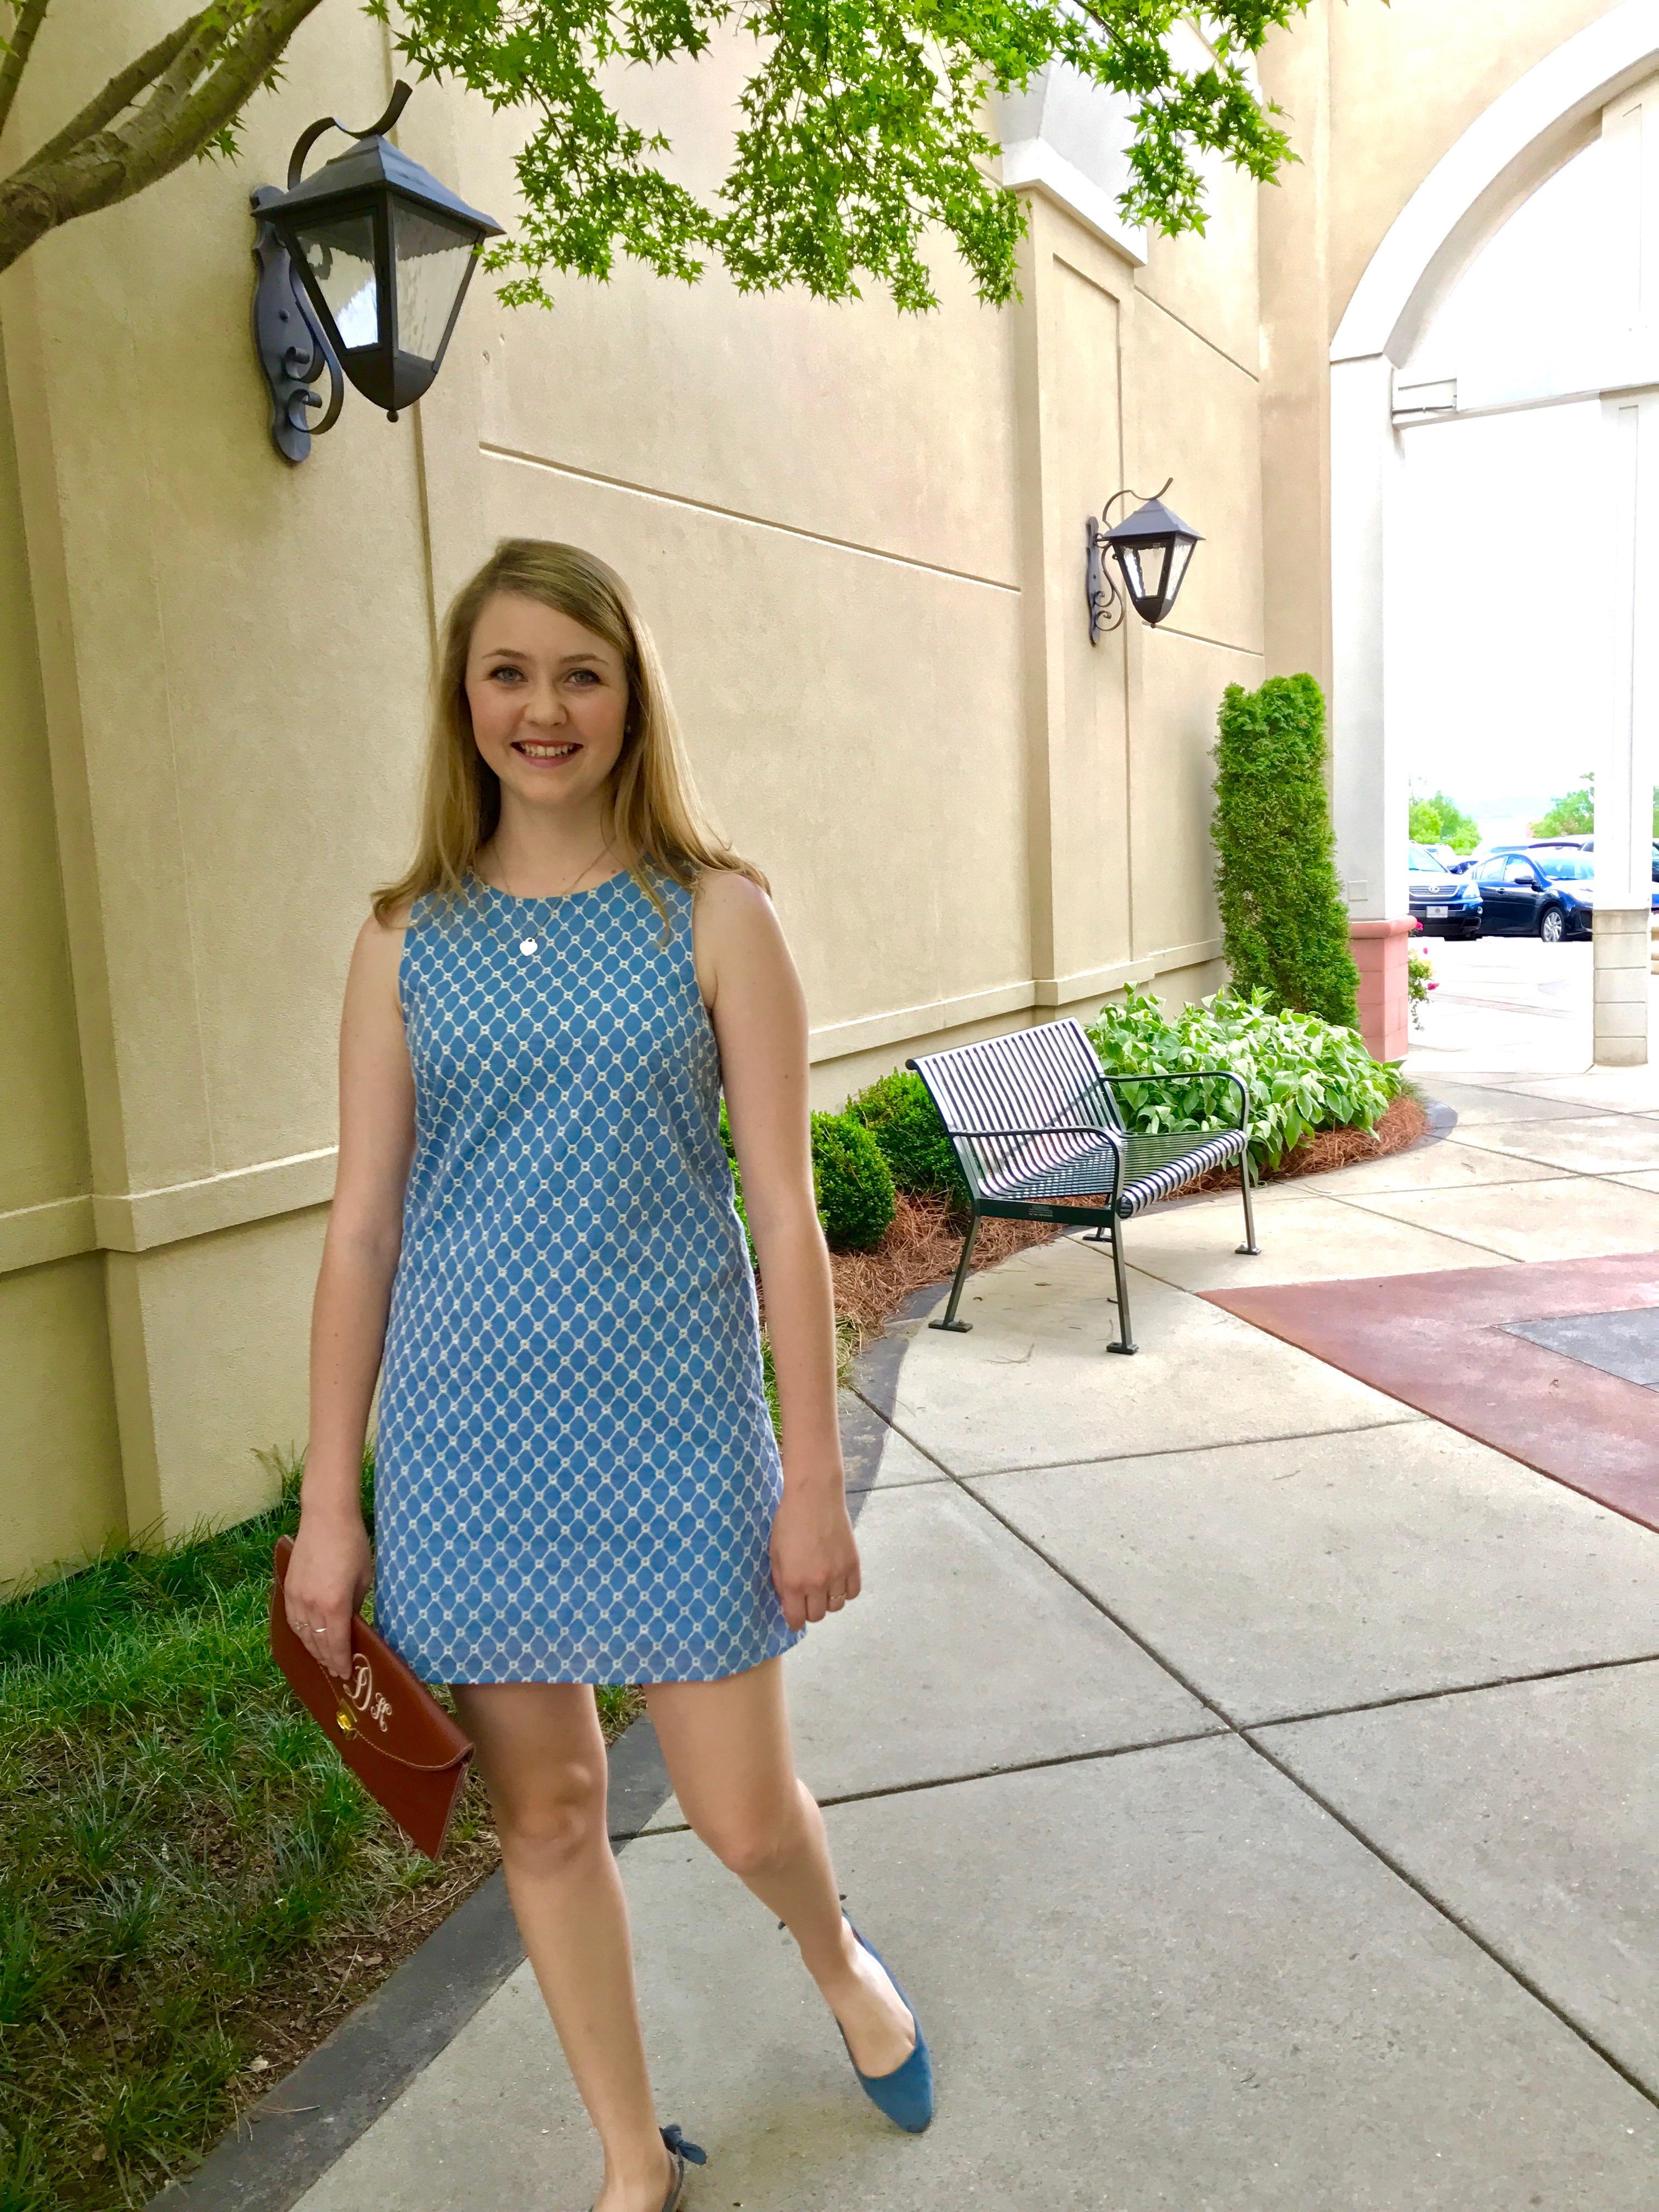 shift dress, cornflower blue with white embroidery, envelope clutch, matching cornflower blue slingback flats